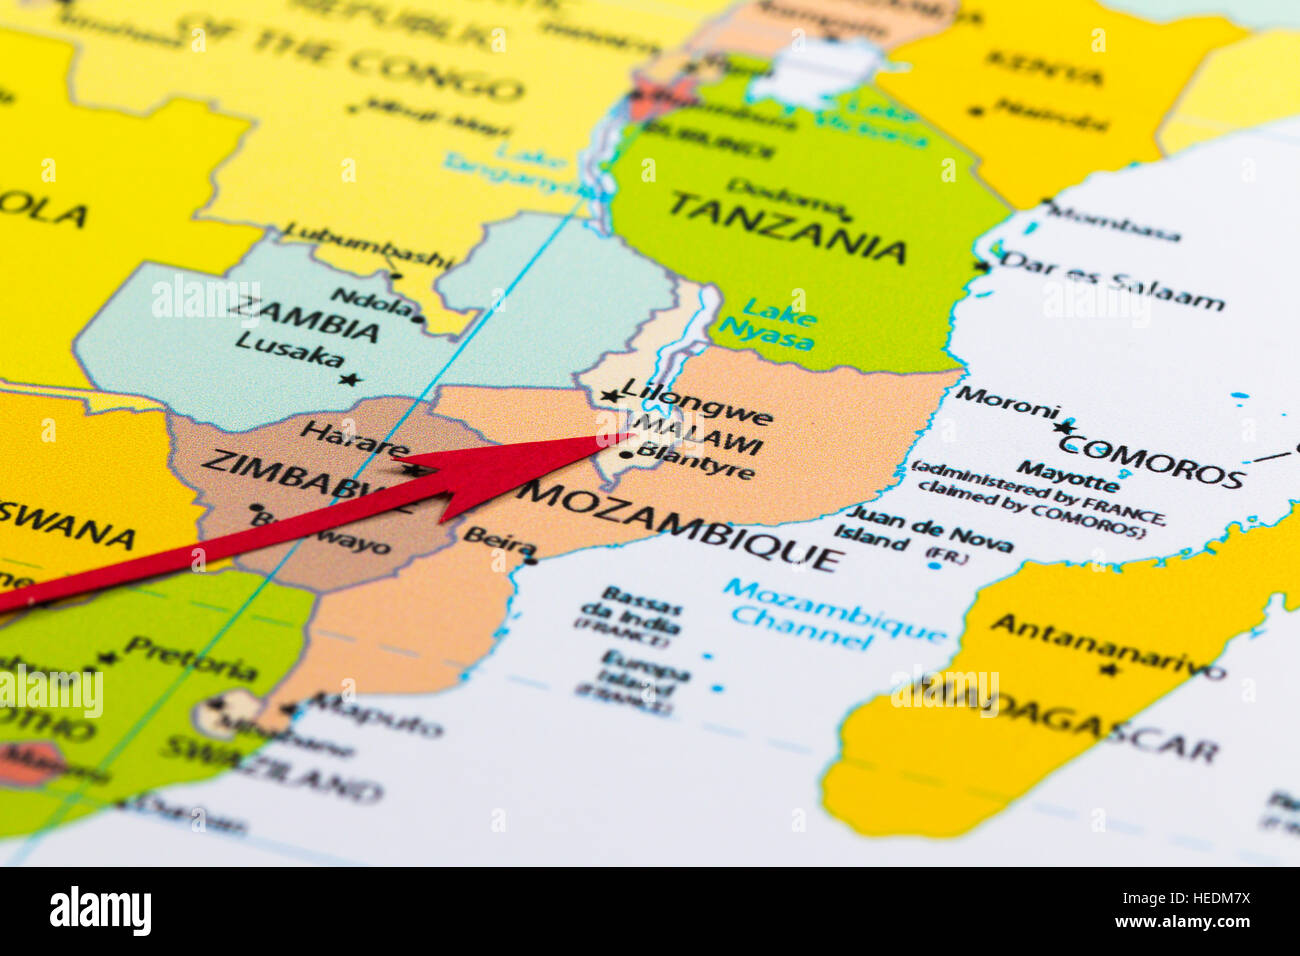 Map Of Africa Malawi Stock Photo Royalty Free Image - Malawi map